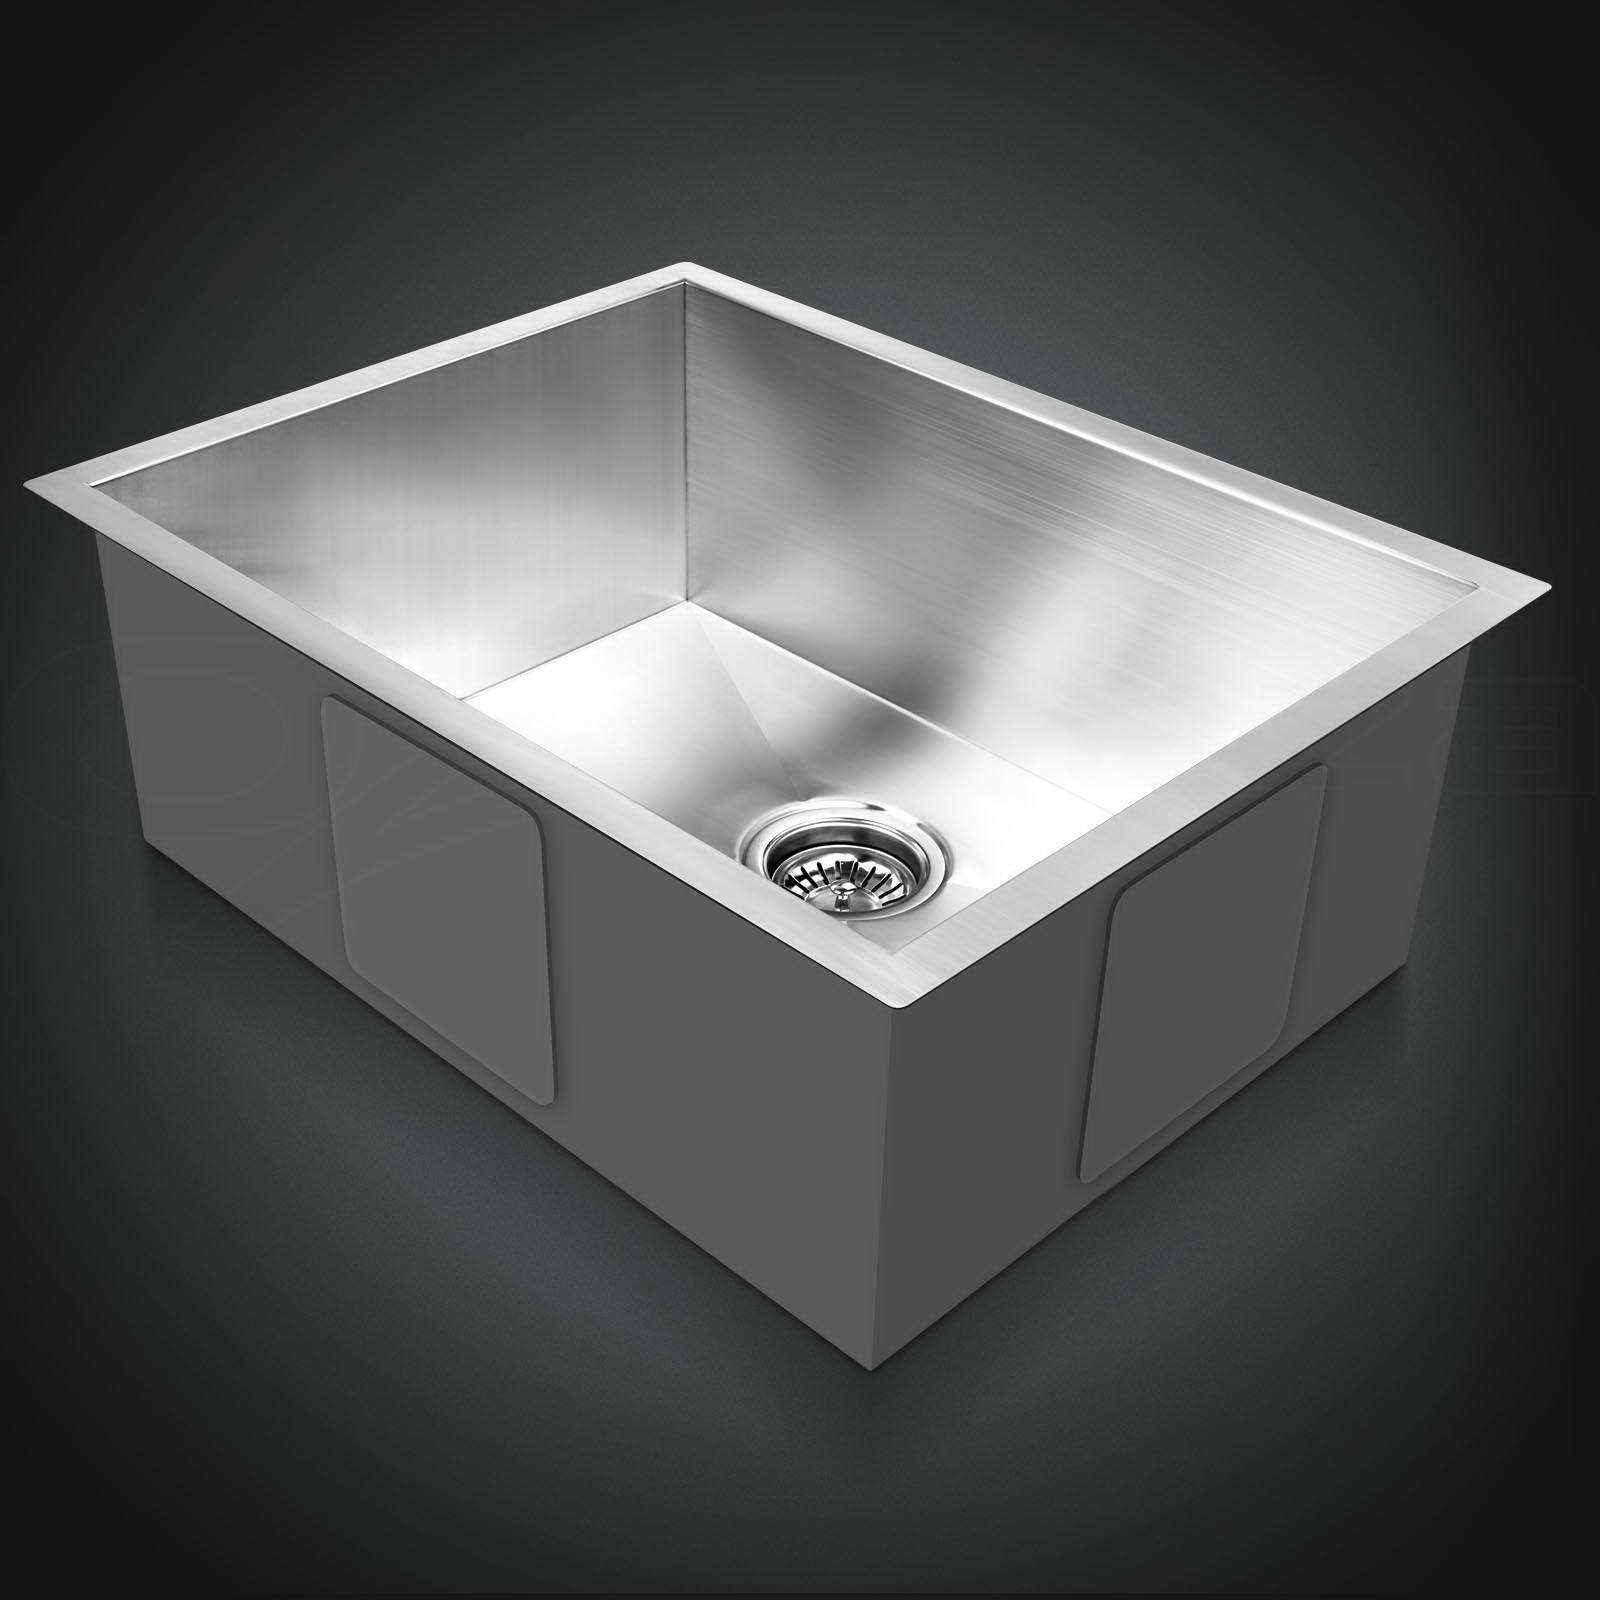 Wholesale Kitchen Sinks Melbourne